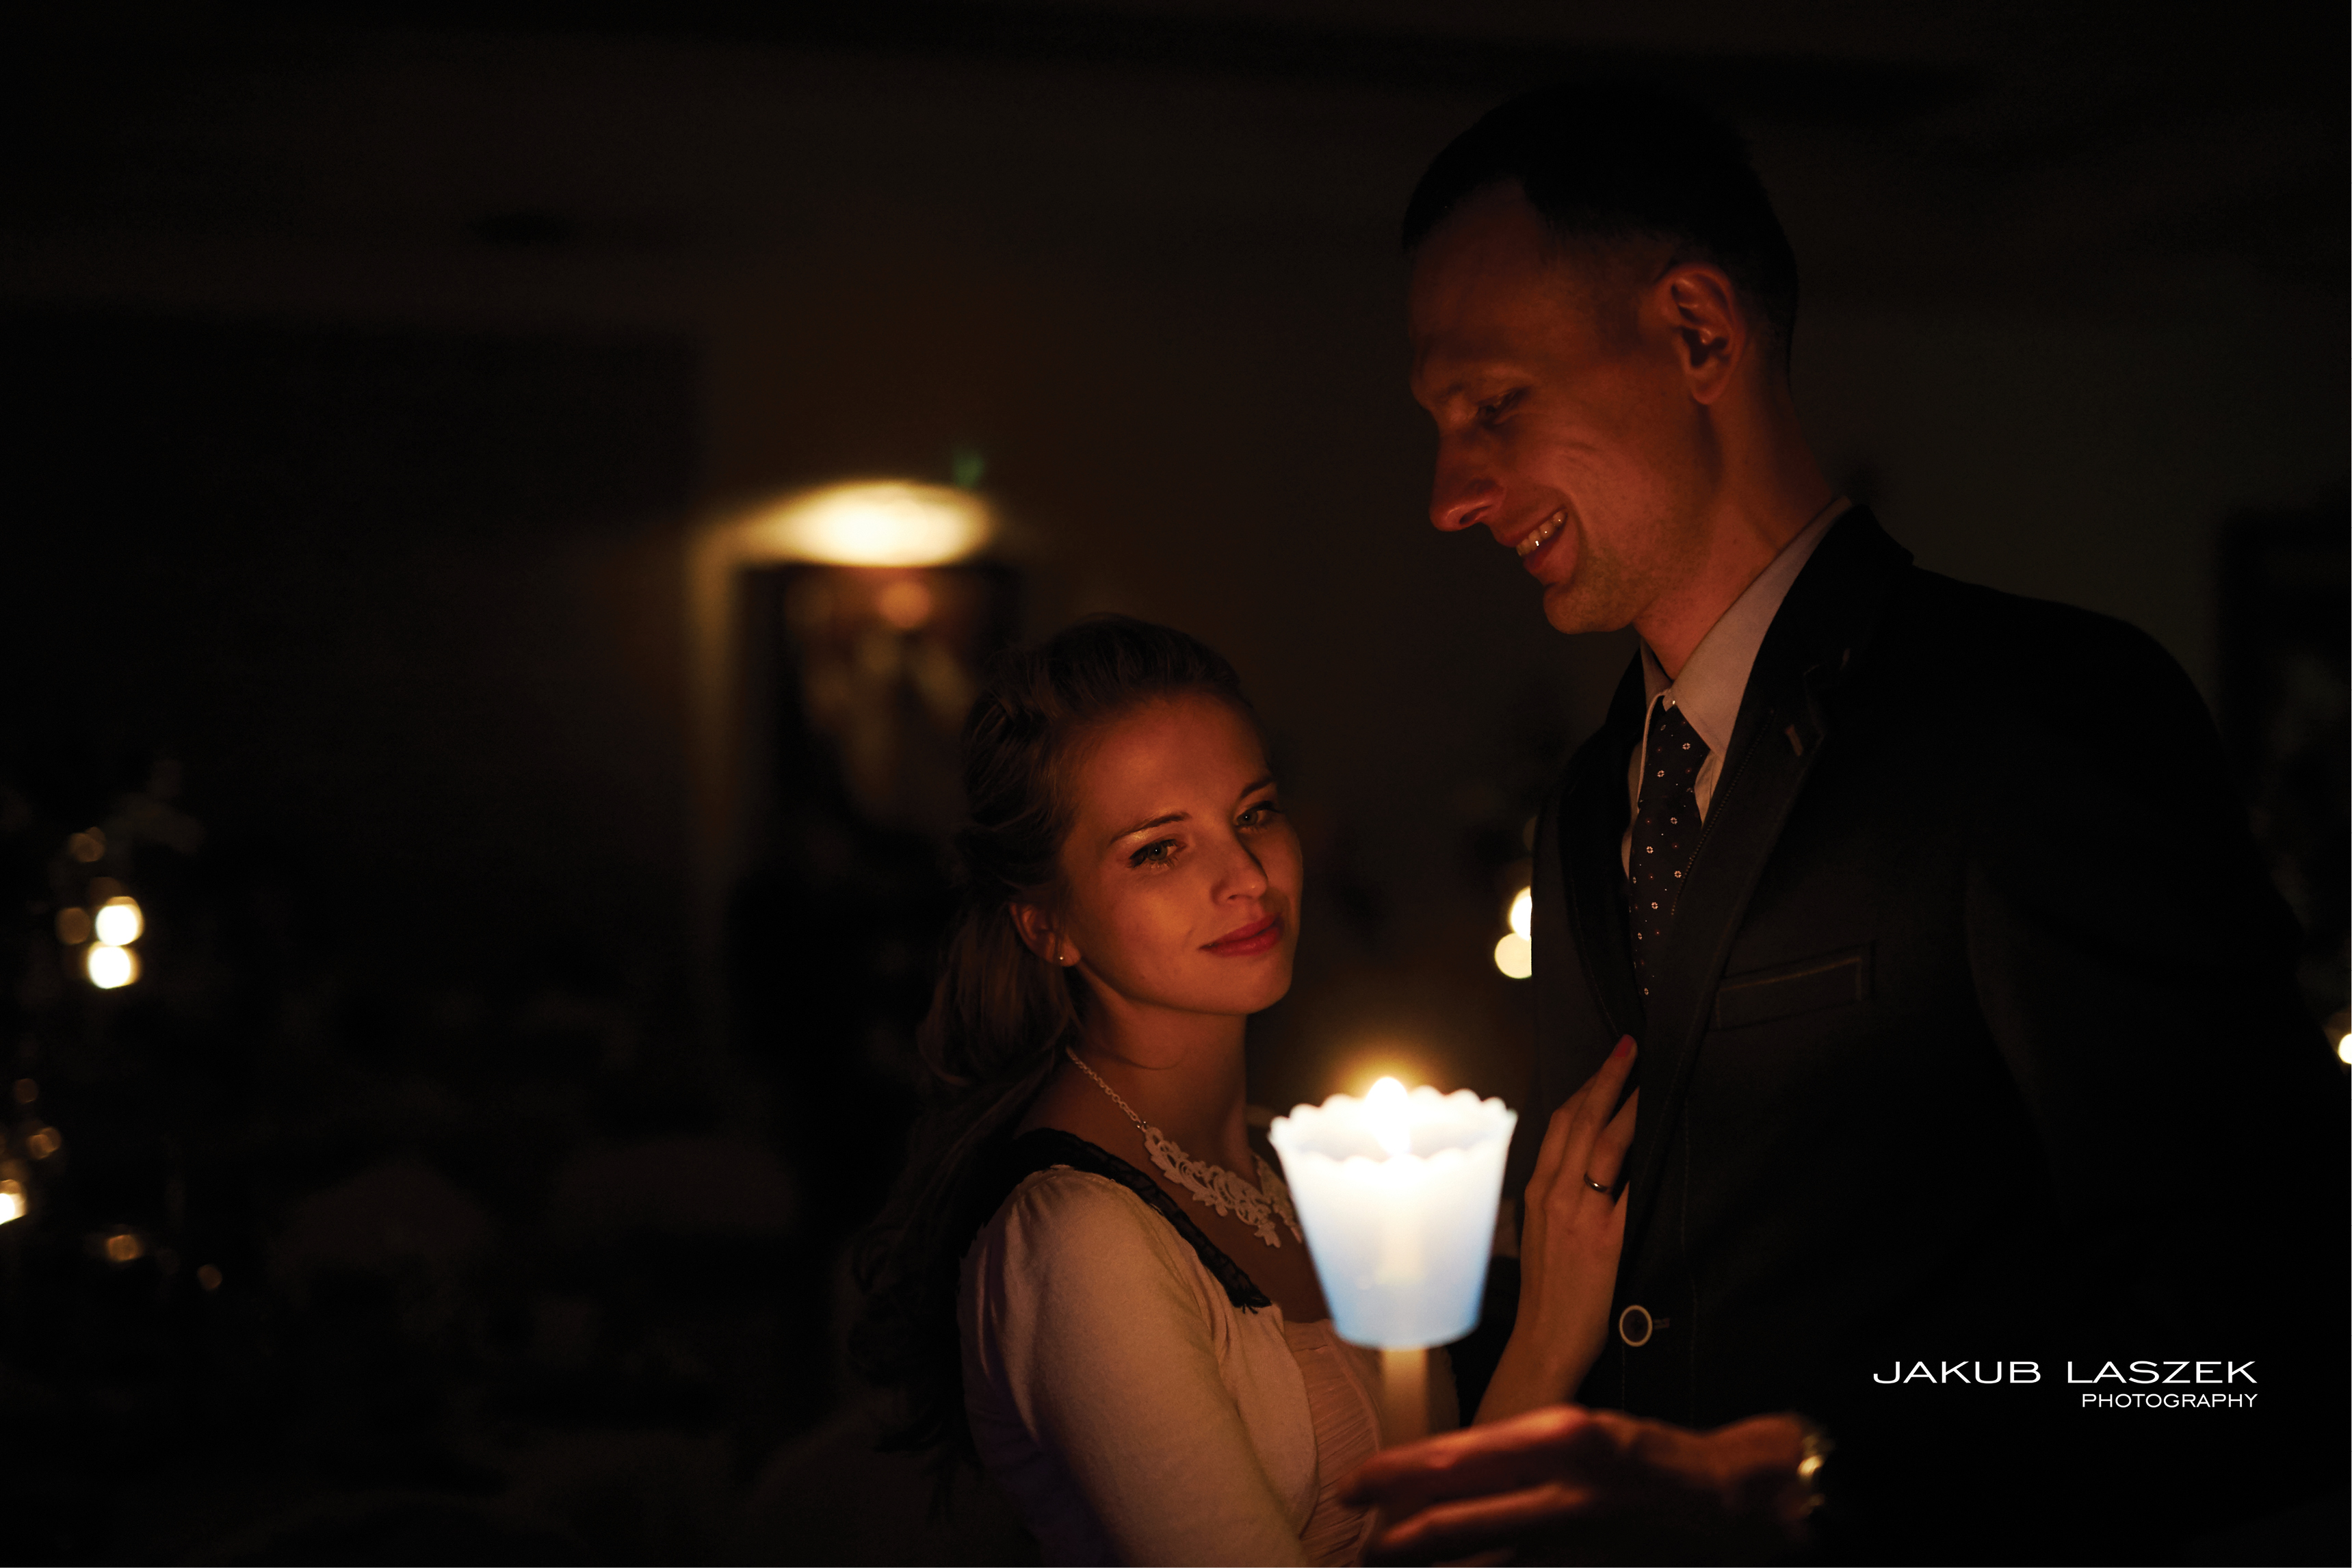 tarnow_fotograf_slubny_wedding_photographer43